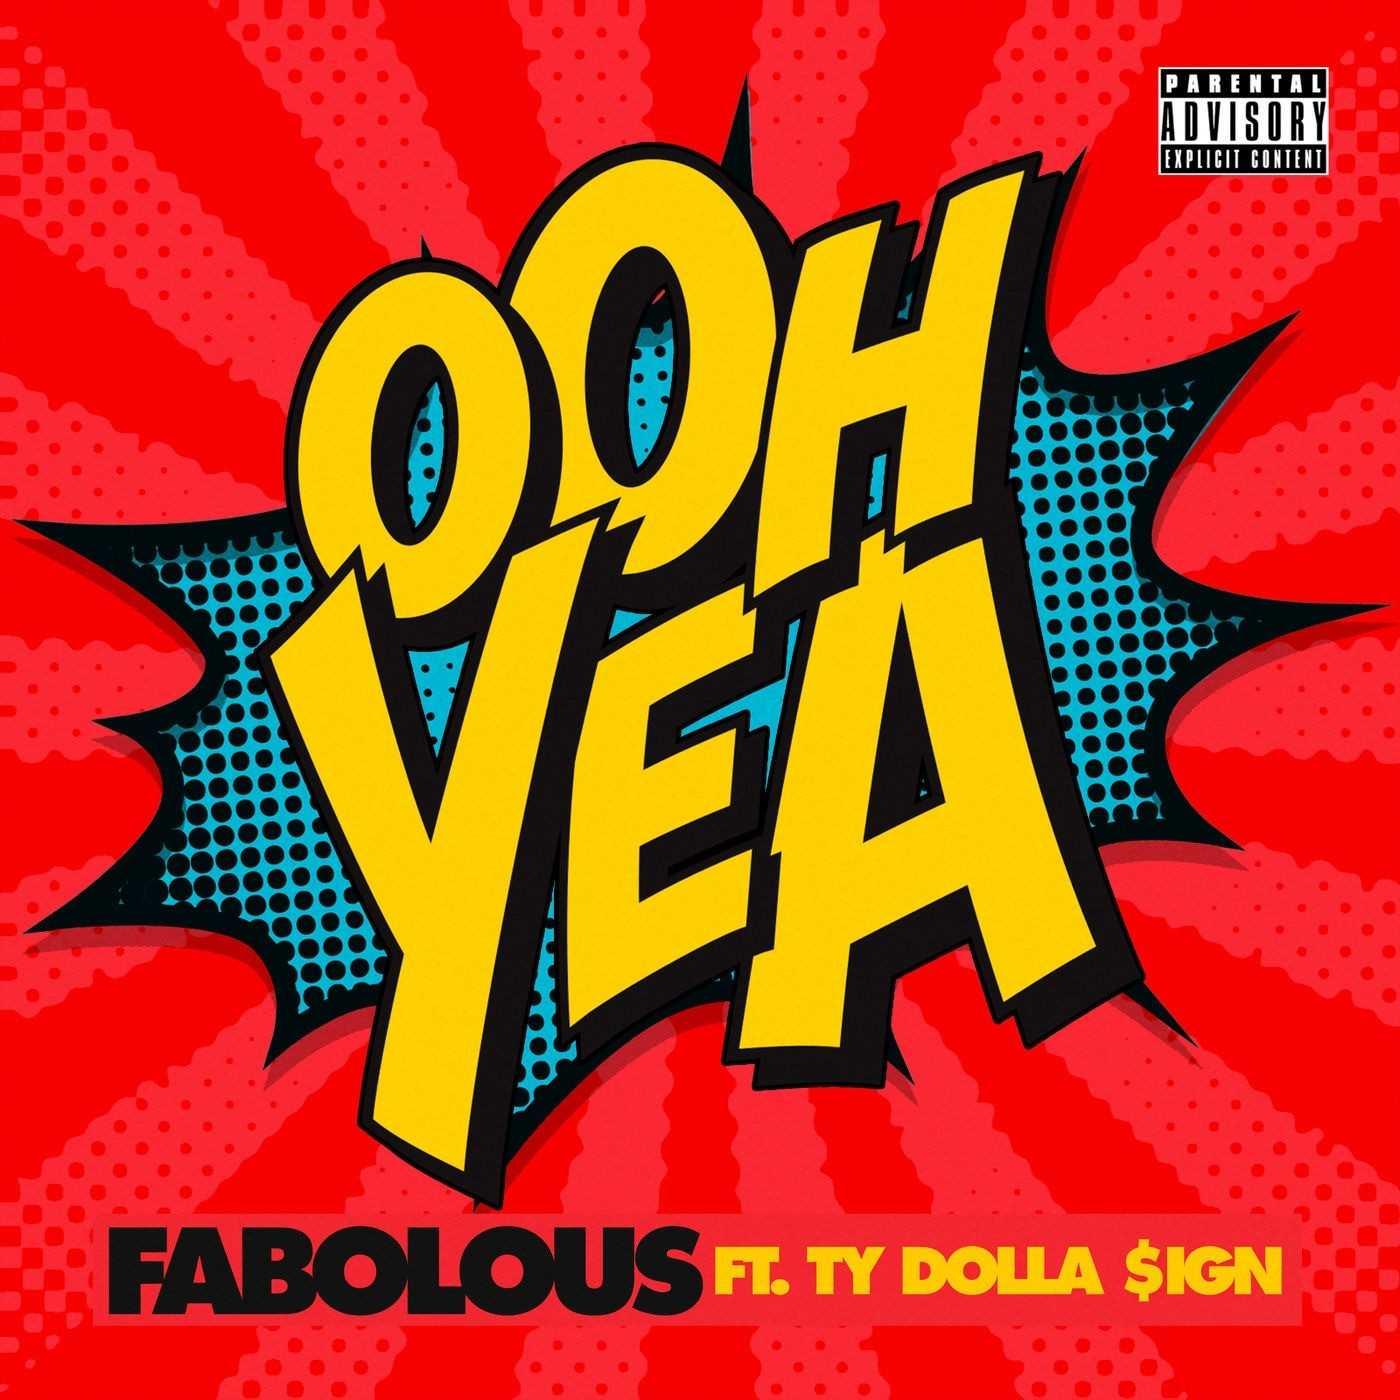 FABOLOUS | OOH YEA (FEAT. TY DOLLA SIGN) [AUDIO]